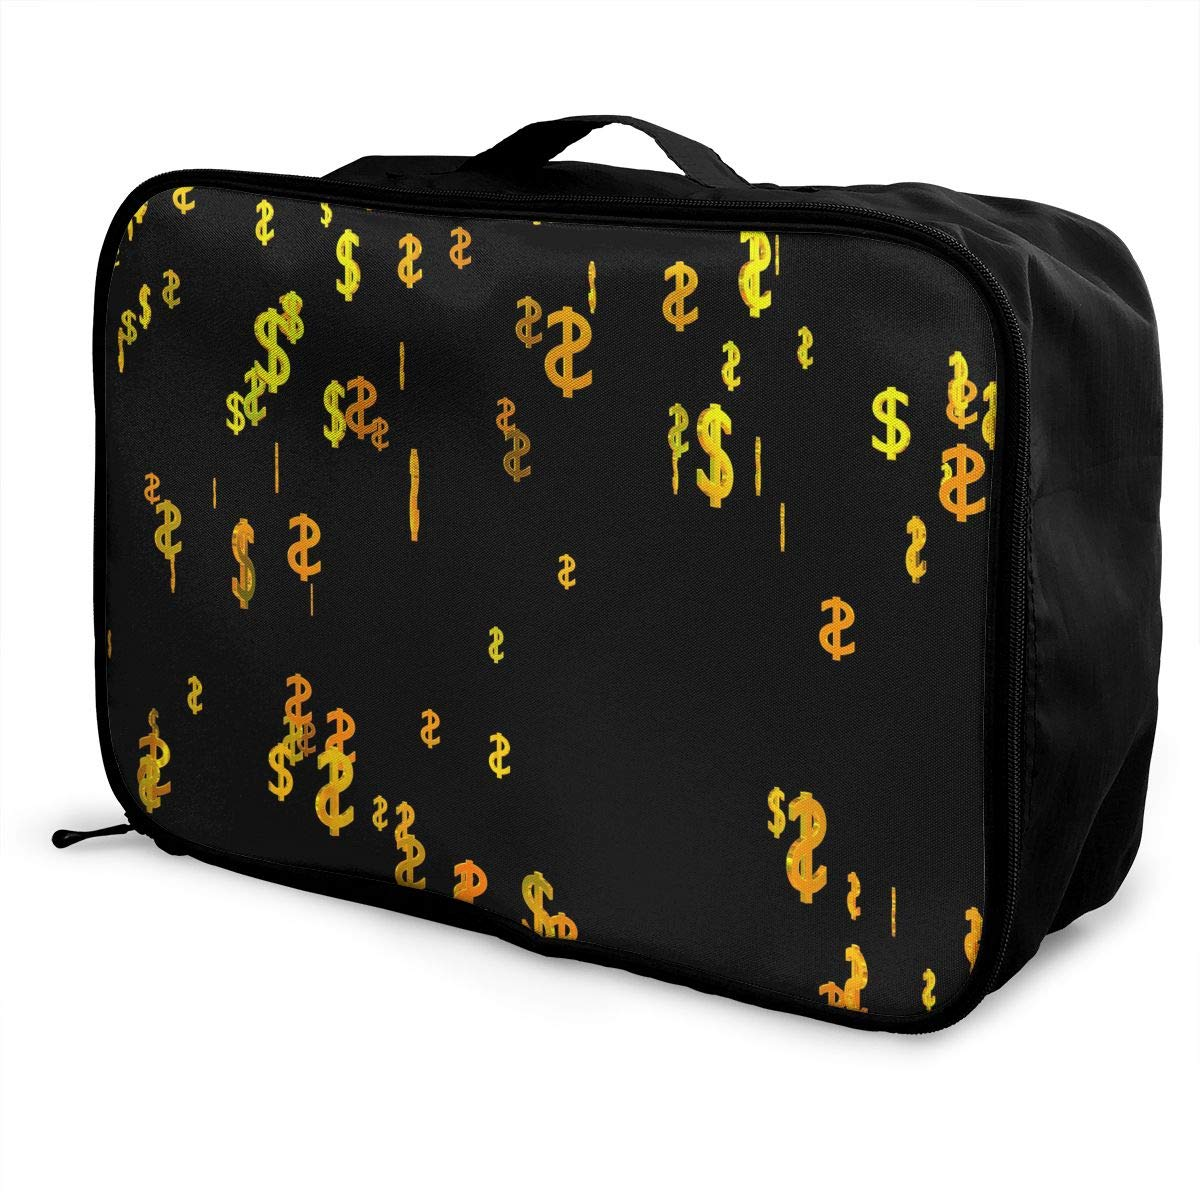 Travel Luggage Duffle Bag Lightweight Portable Handbag Dollar Pattern Large Capacity Waterproof Foldable Storage Tote